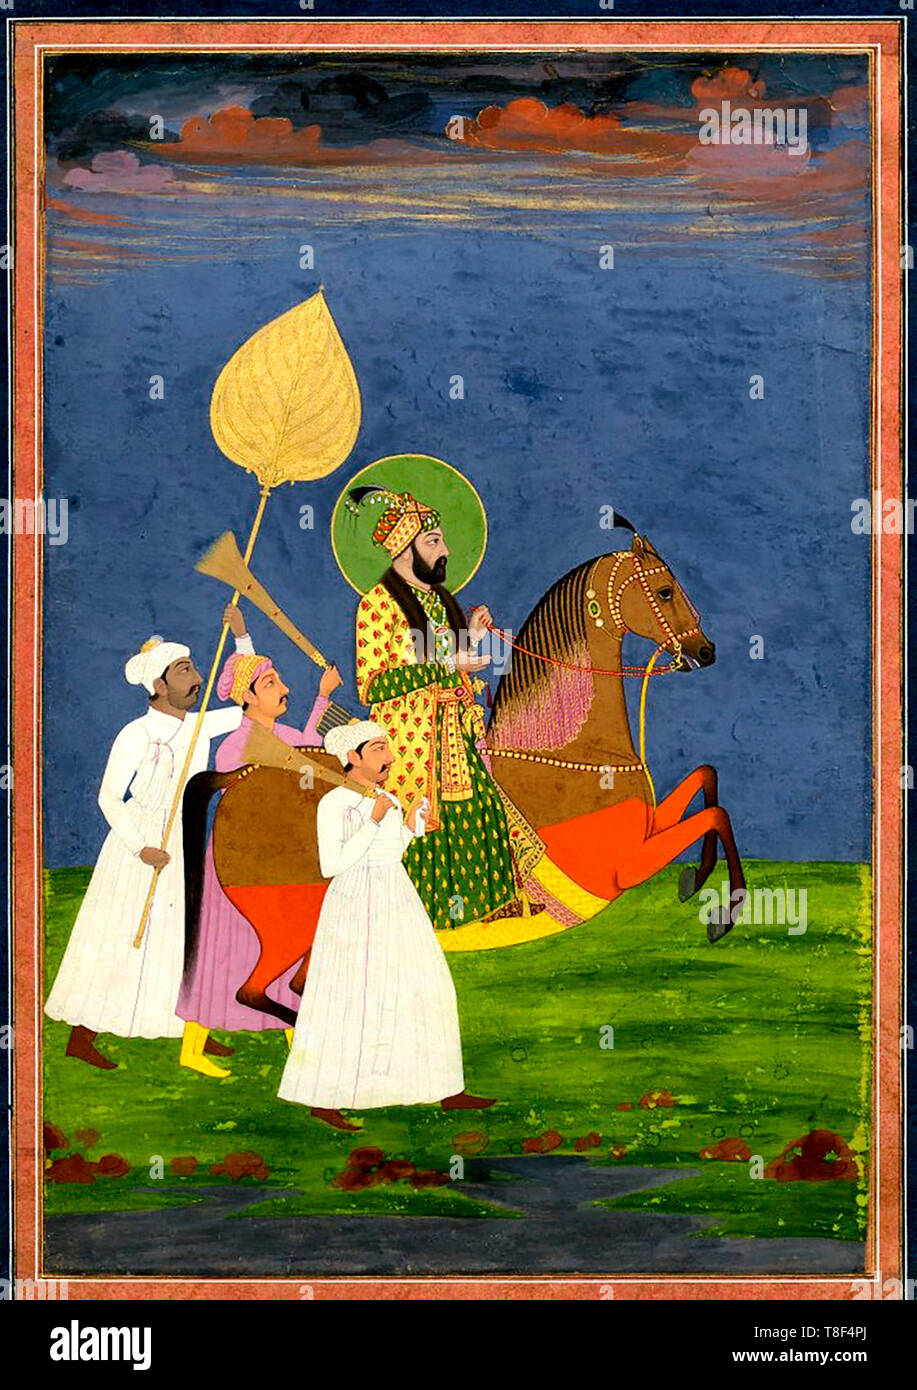 Portrait. Farrukh Siyar on horseback with attendants. On paper. According to reg Emperor Muḥammad Shah. 18th Century - Stock Image